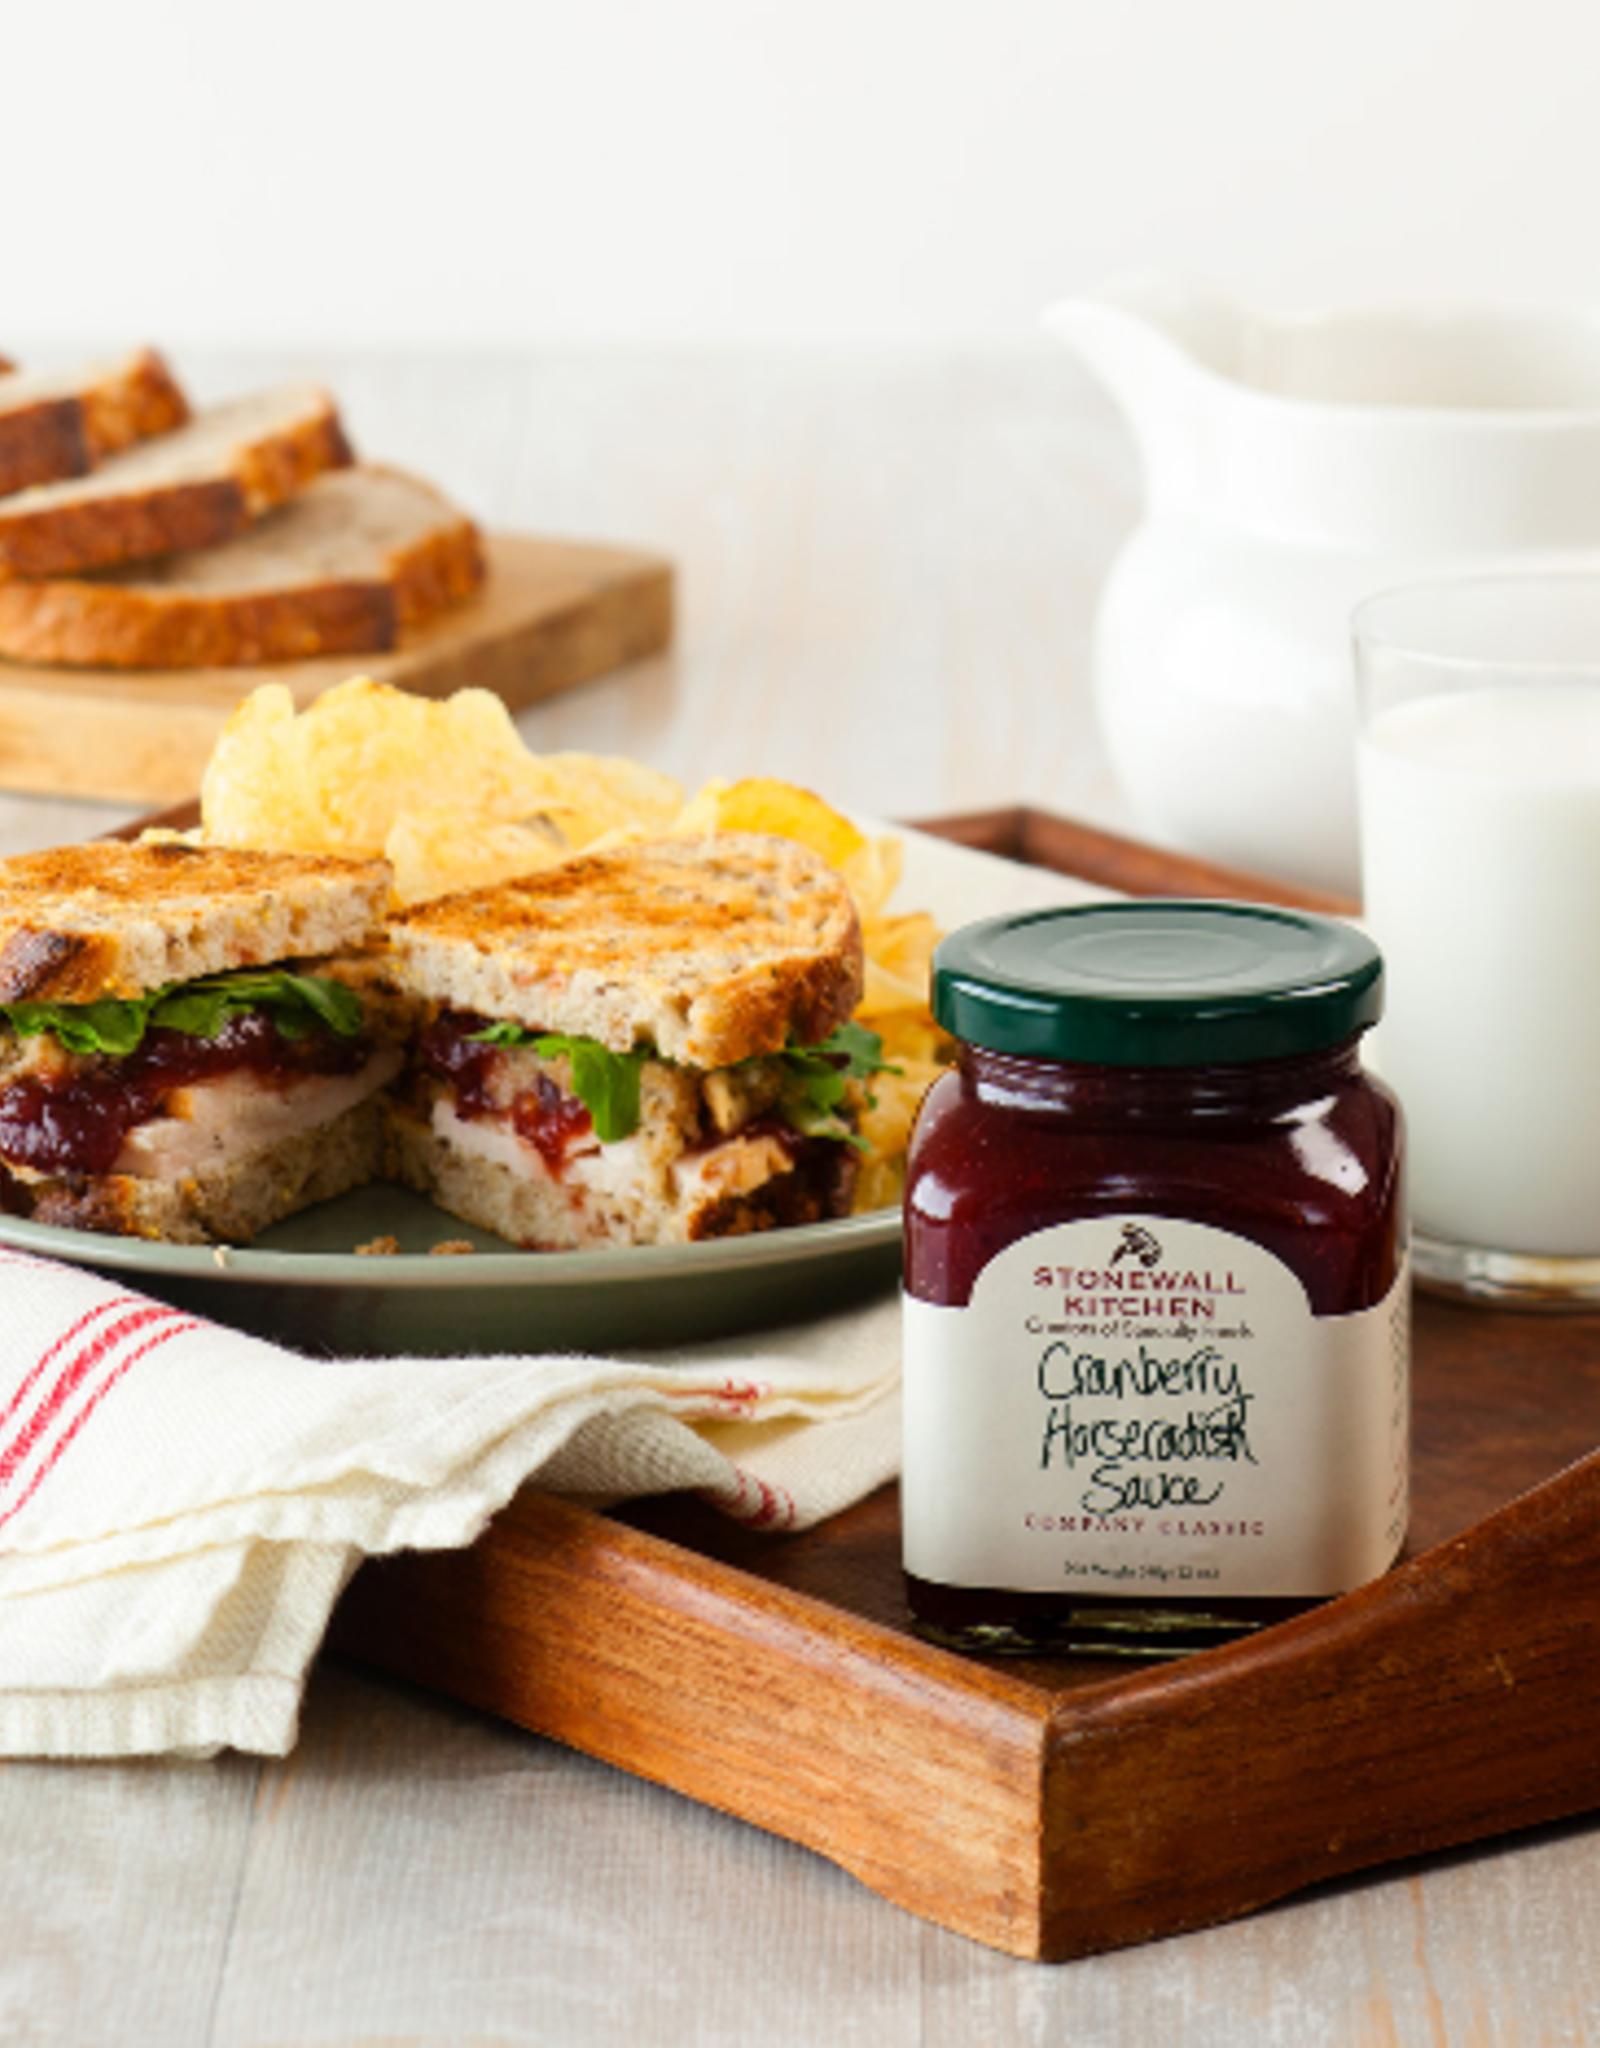 Stonewall Kitchen Cranberry Horseradish Sauce